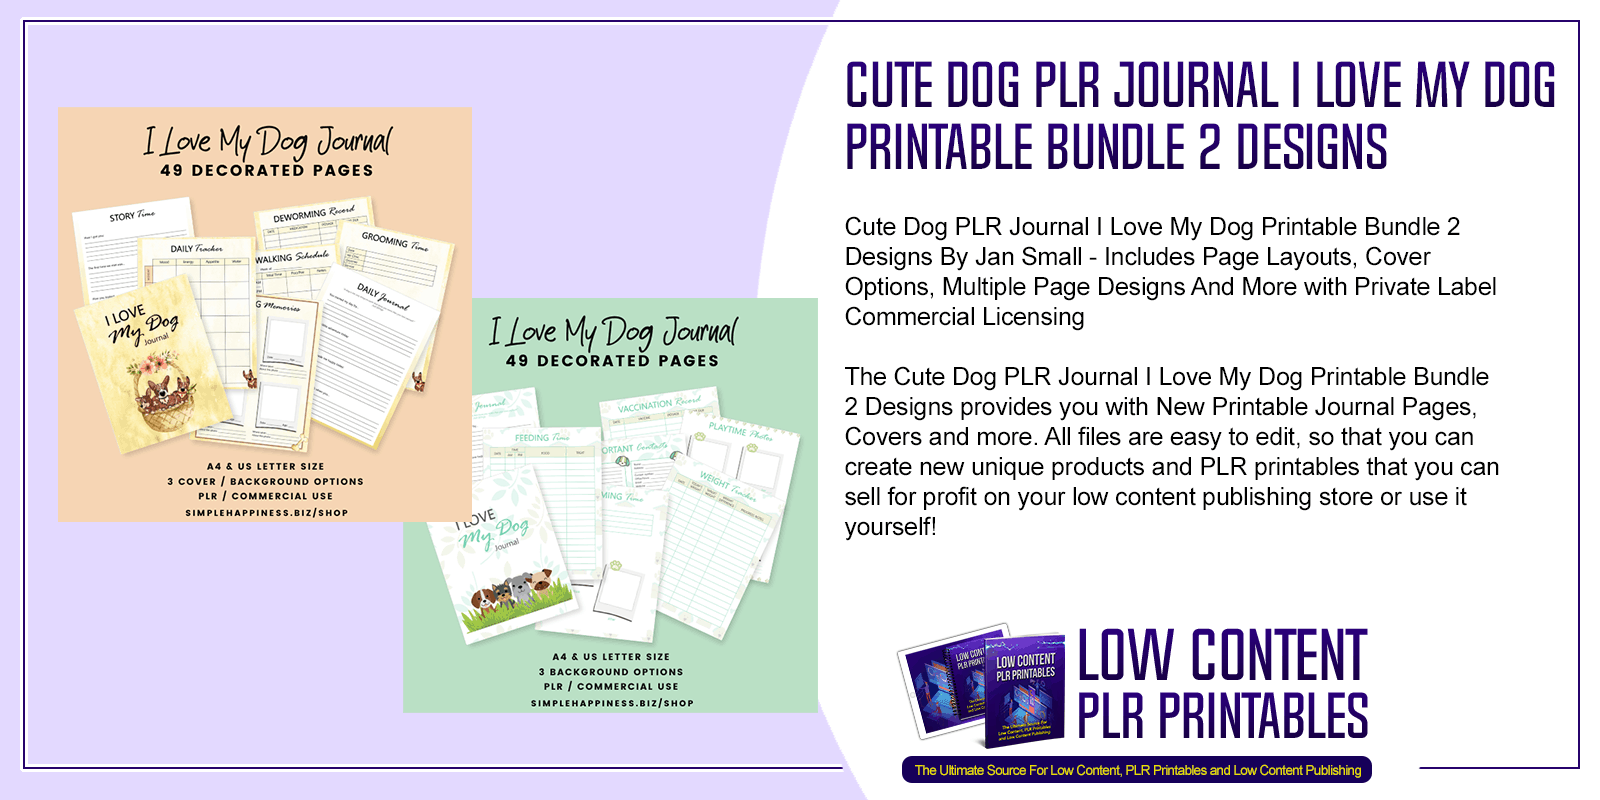 Cute Dog PLR Journal I Love My Dog Printable Bundle 2 Designs